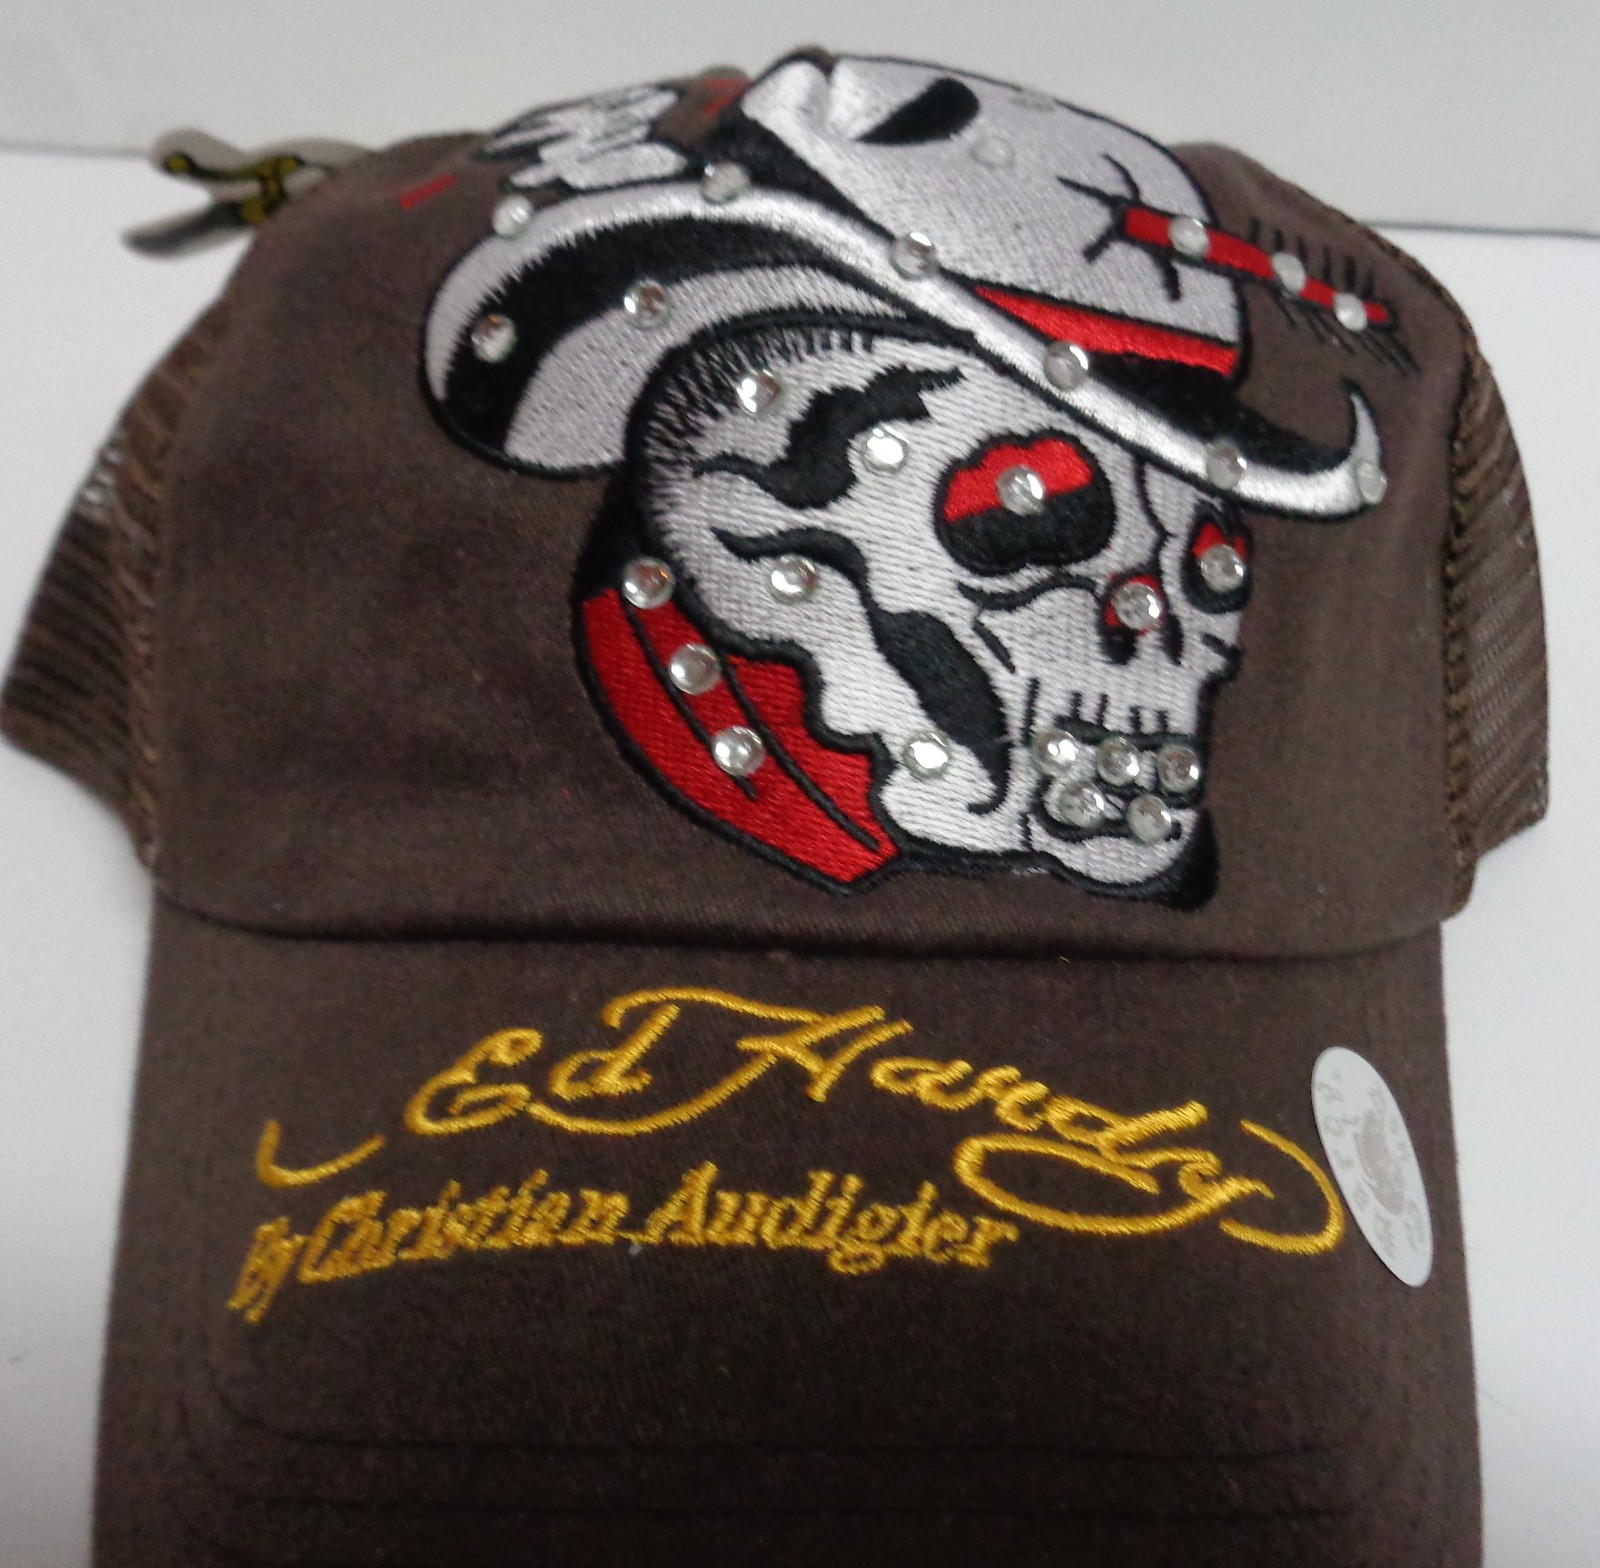 Vintage Hat Tattoos: Ed Hardy Brown Cowboy Skull Arrow Vintage Tattoo Cap Hat